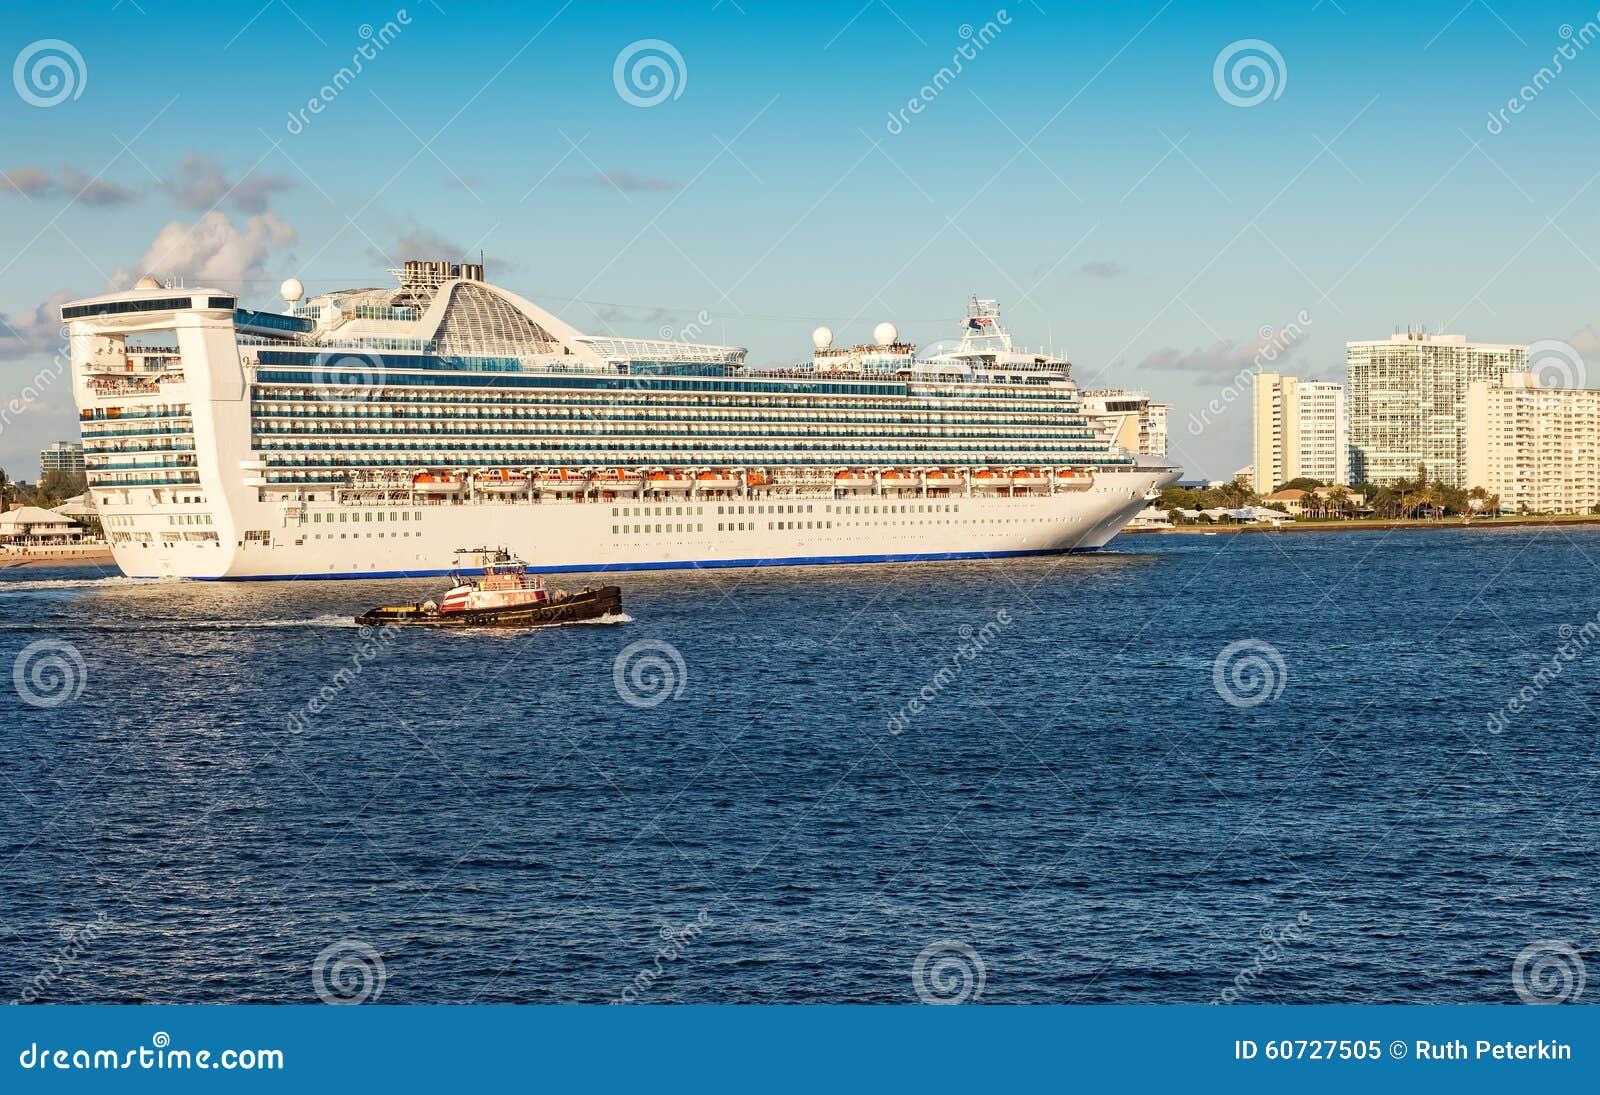 Cruise Ships Out Of Florida Fitbudha Com